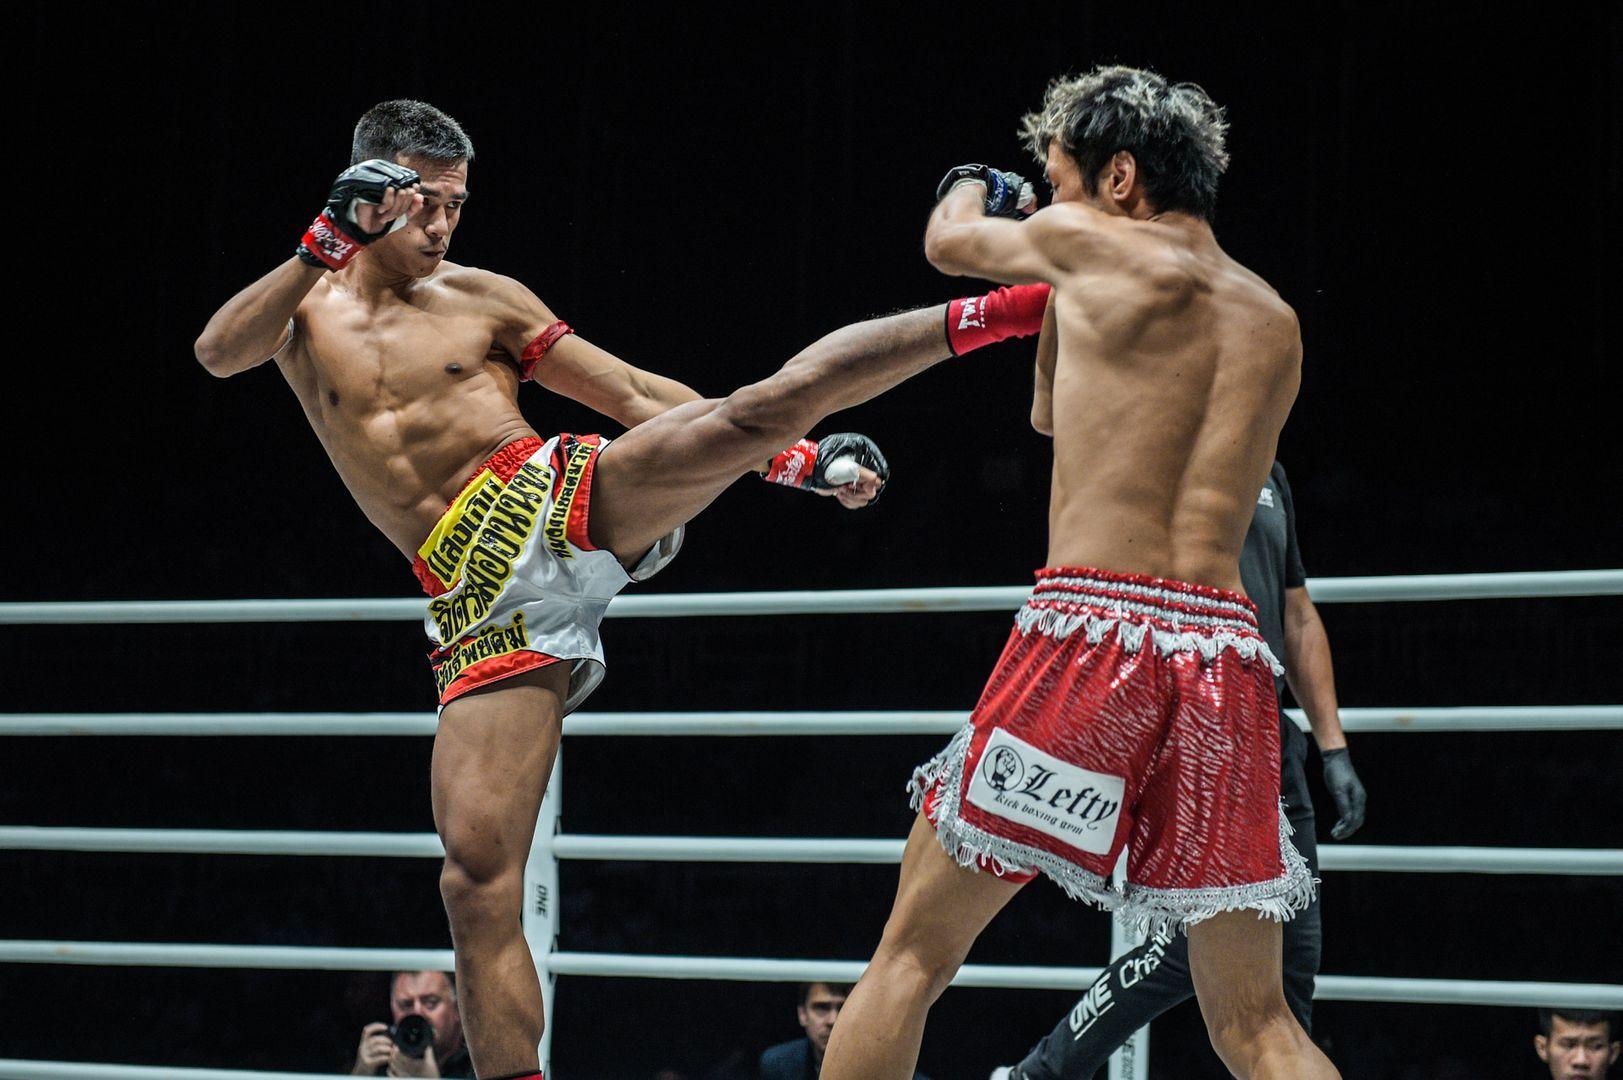 Muay Thai World Champion Panpayak Jitmuangnon blasts his rival with a roundhouse kick